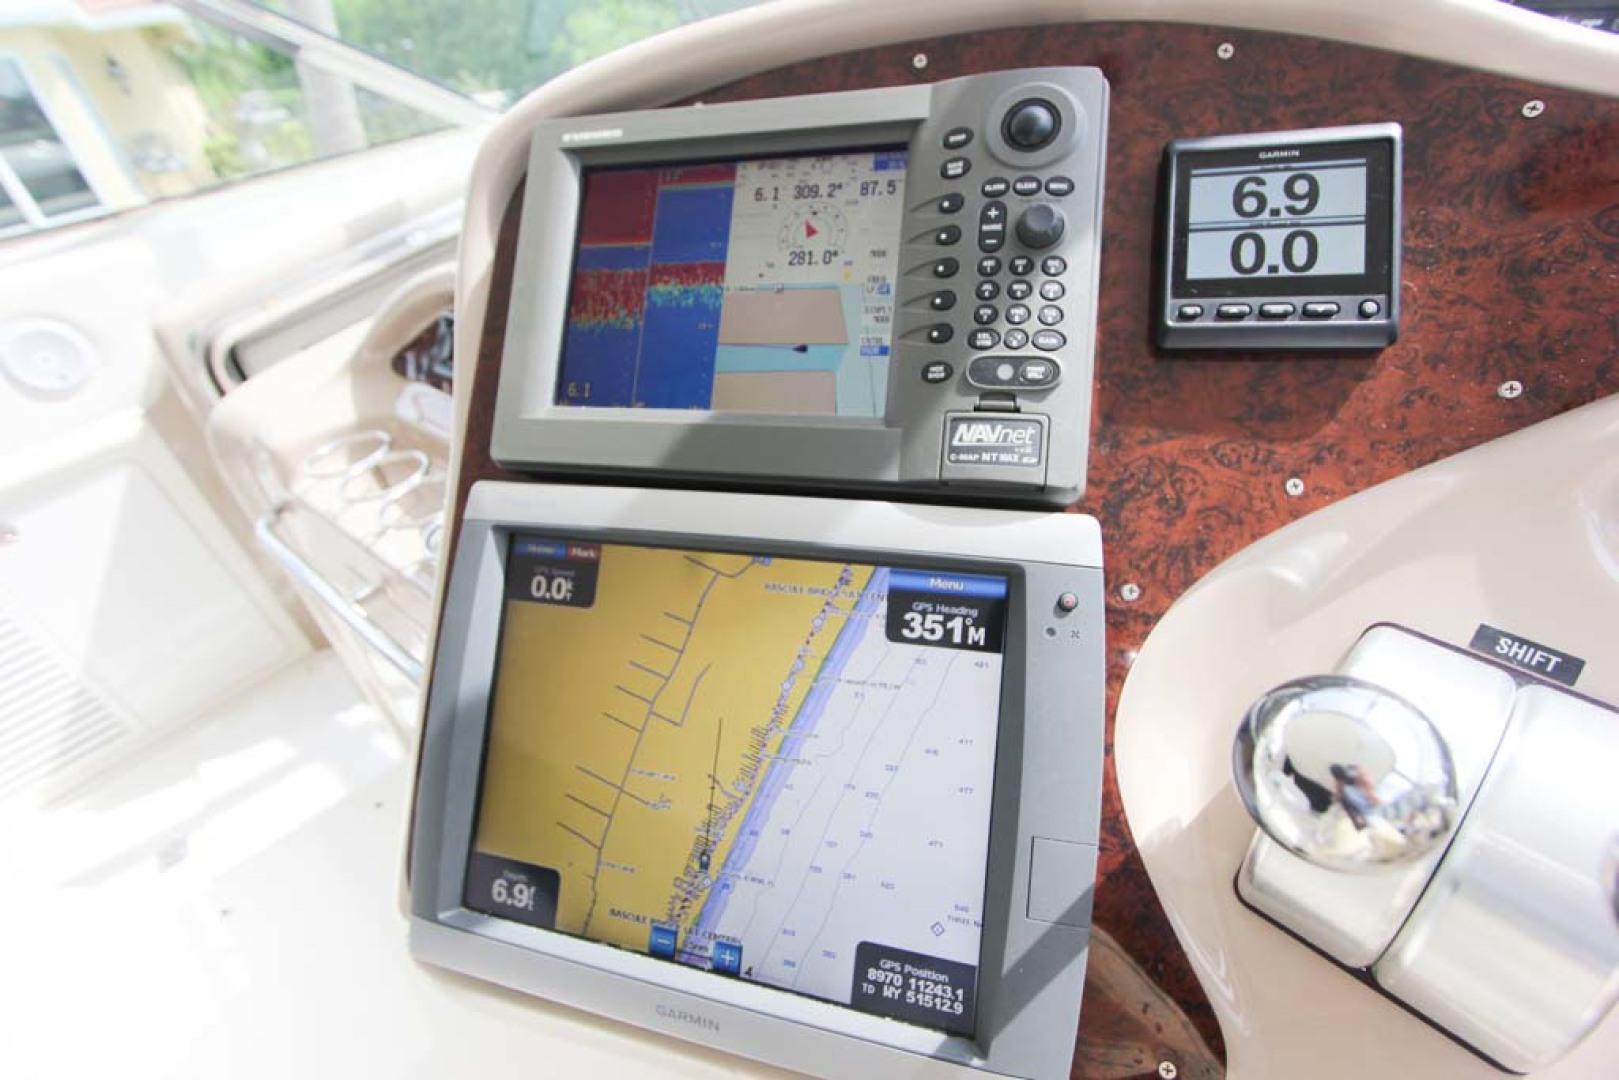 Sea Ray-Sundancer 2001-Lasting Impression Ft. Lauderdale-Florida-United States-Helm and Electronics-1065002 | Thumbnail